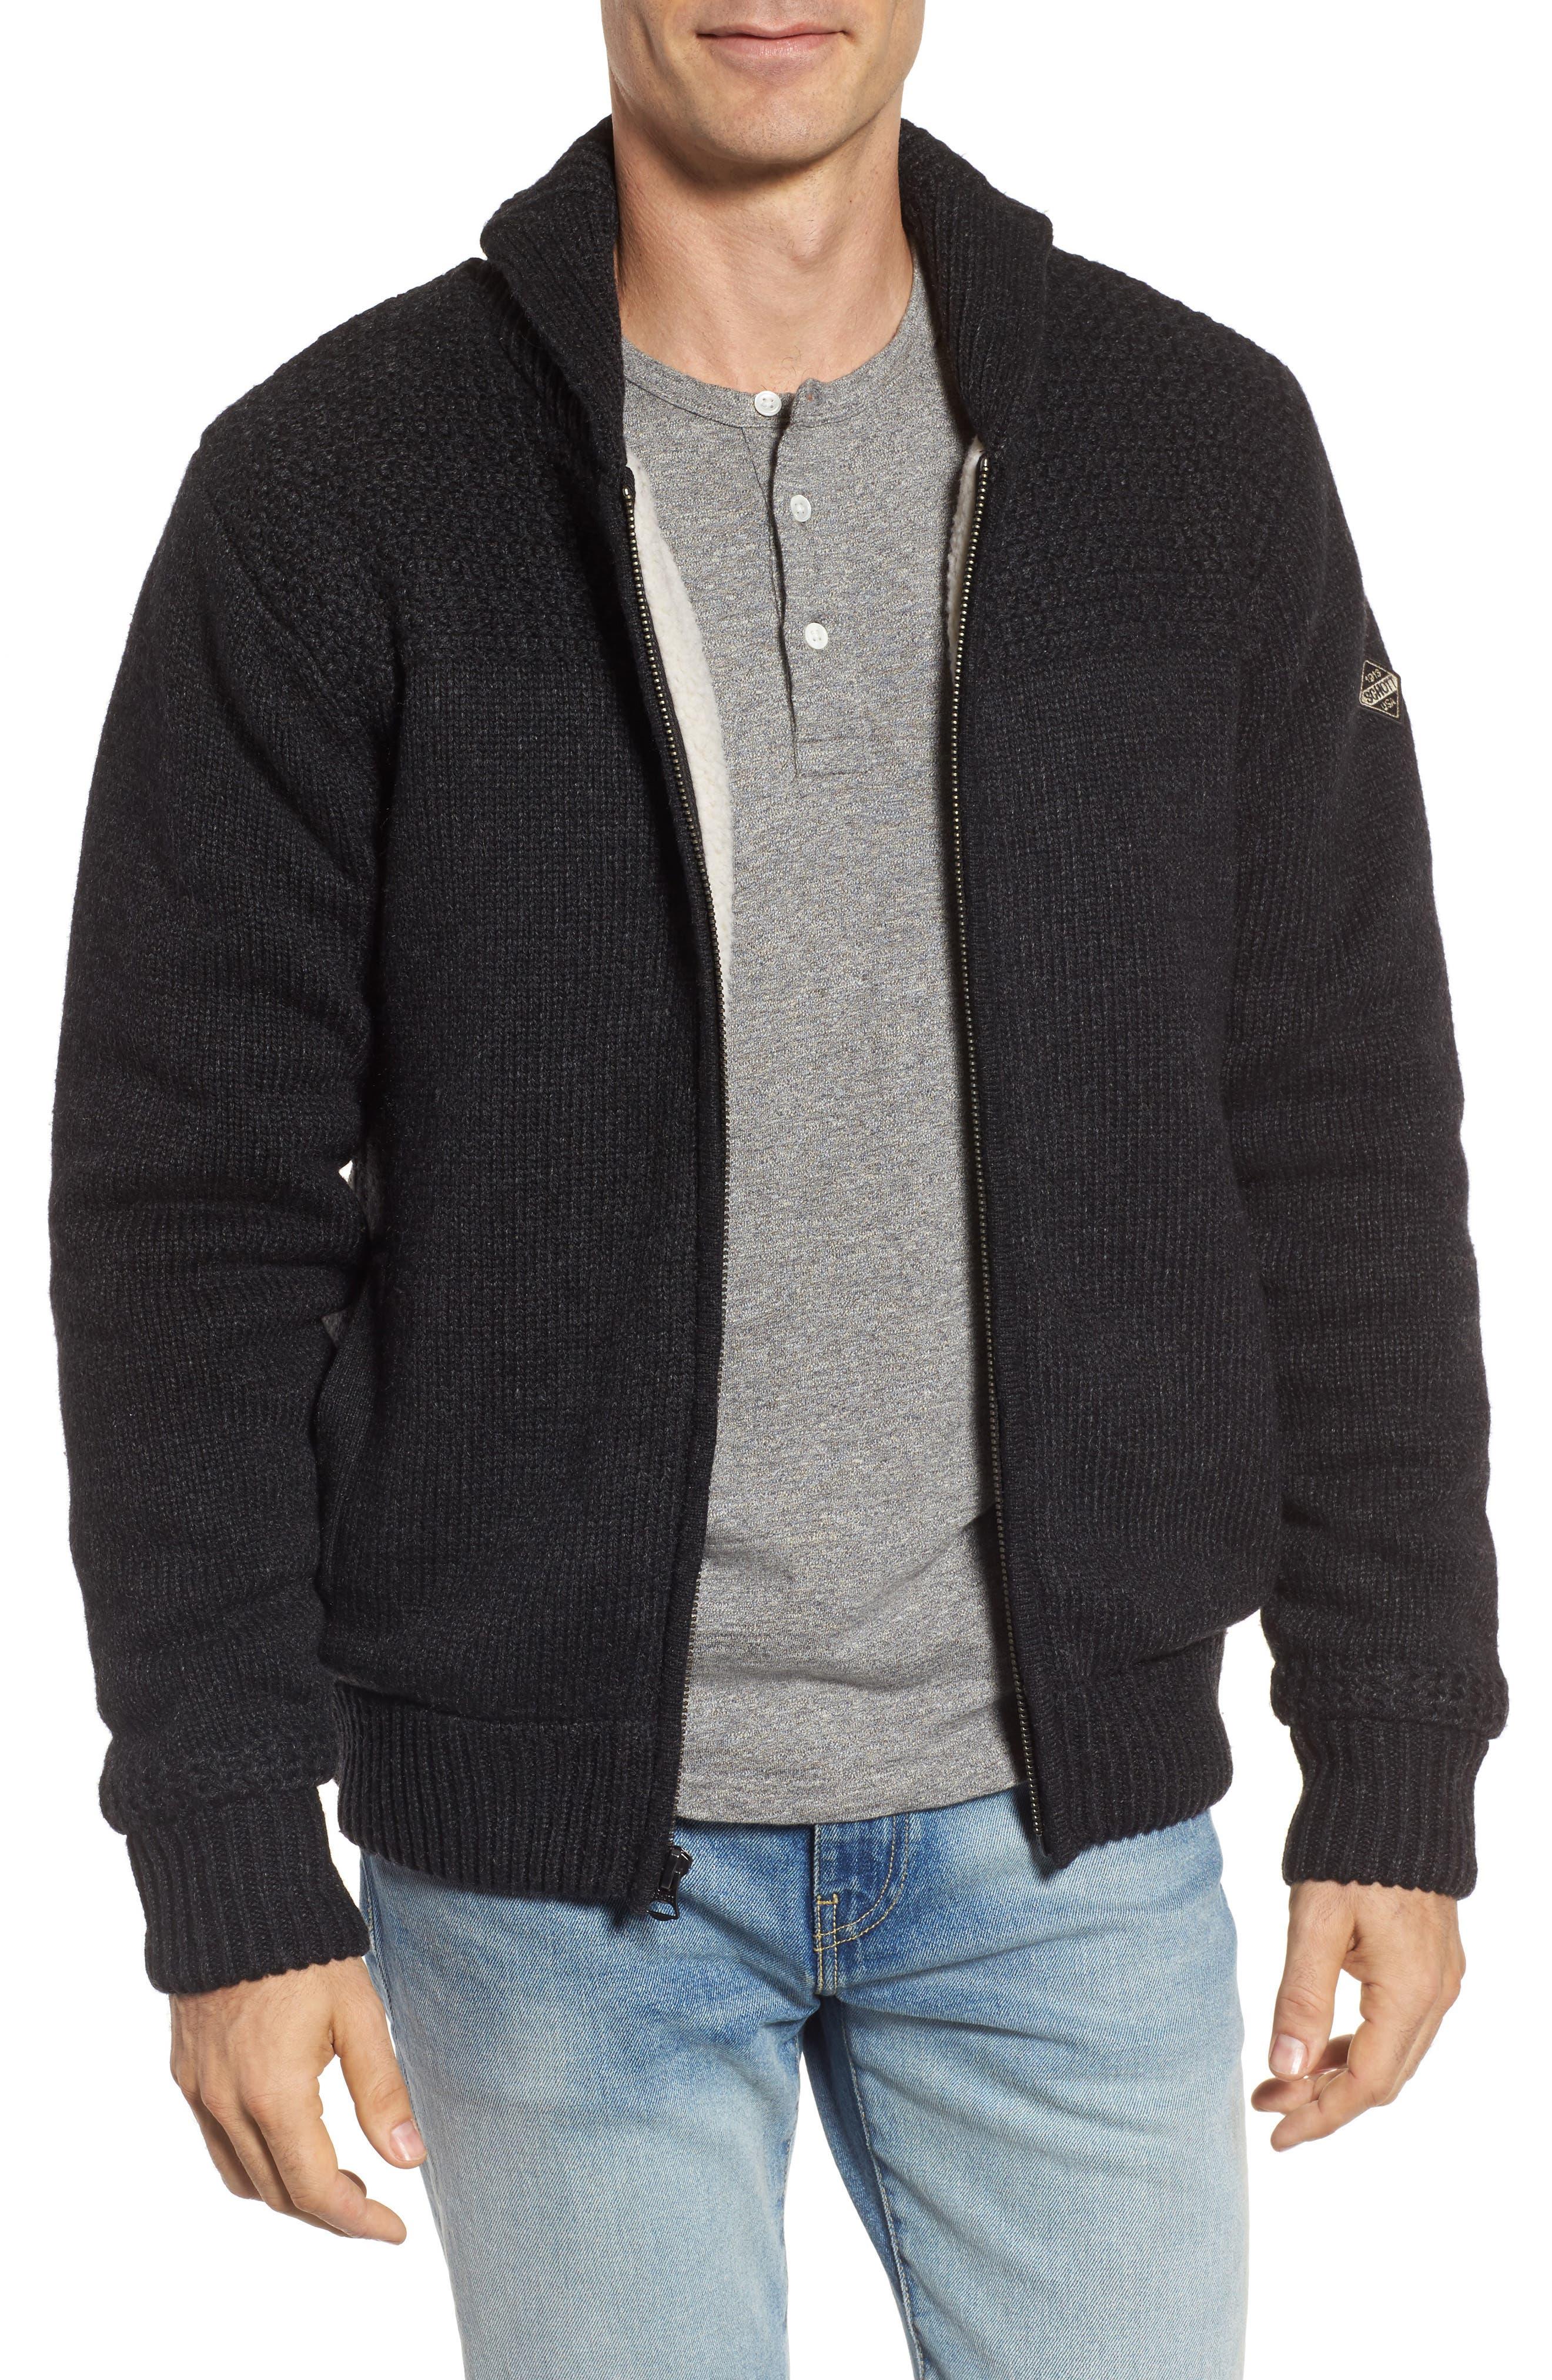 57c37e75a2 Lined Wool Zip Sweater, Black